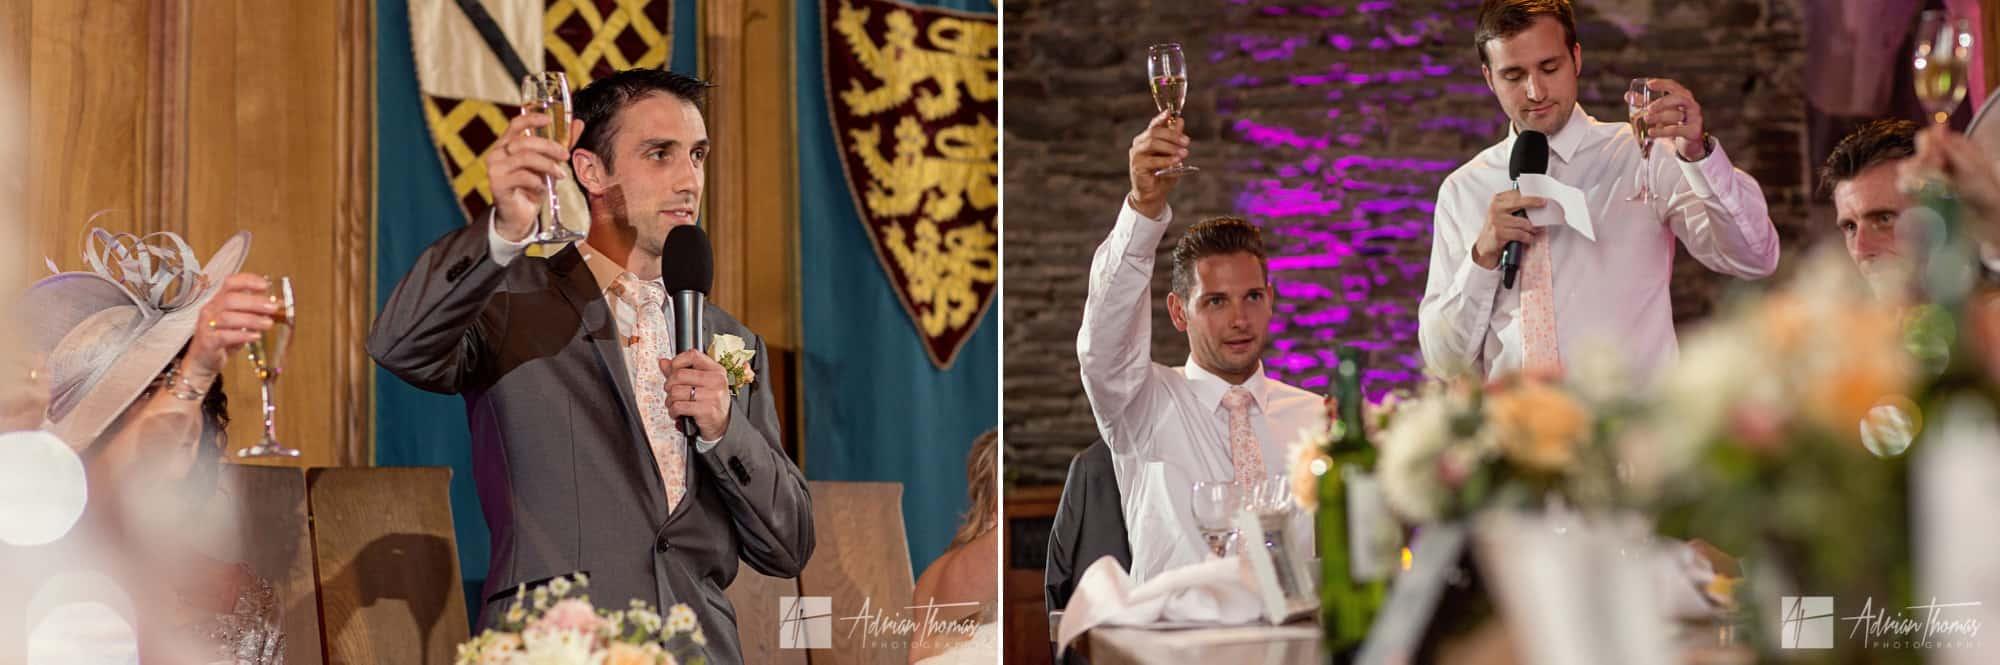 Wedding toast.